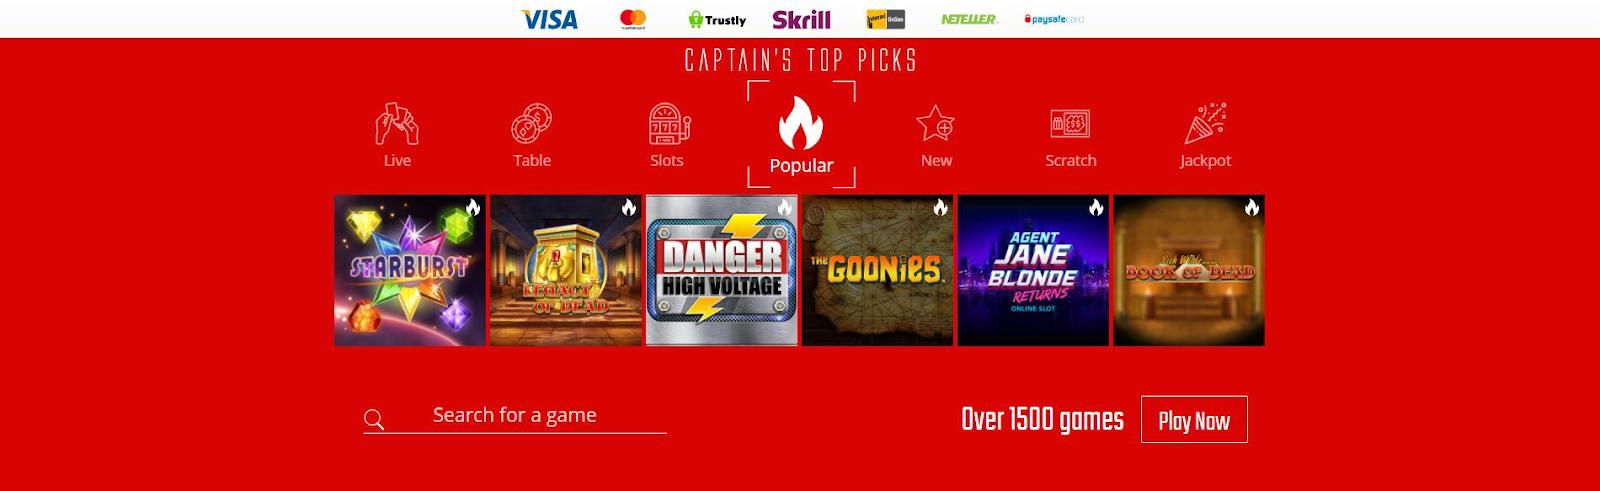 online-casino-games-captain-spins